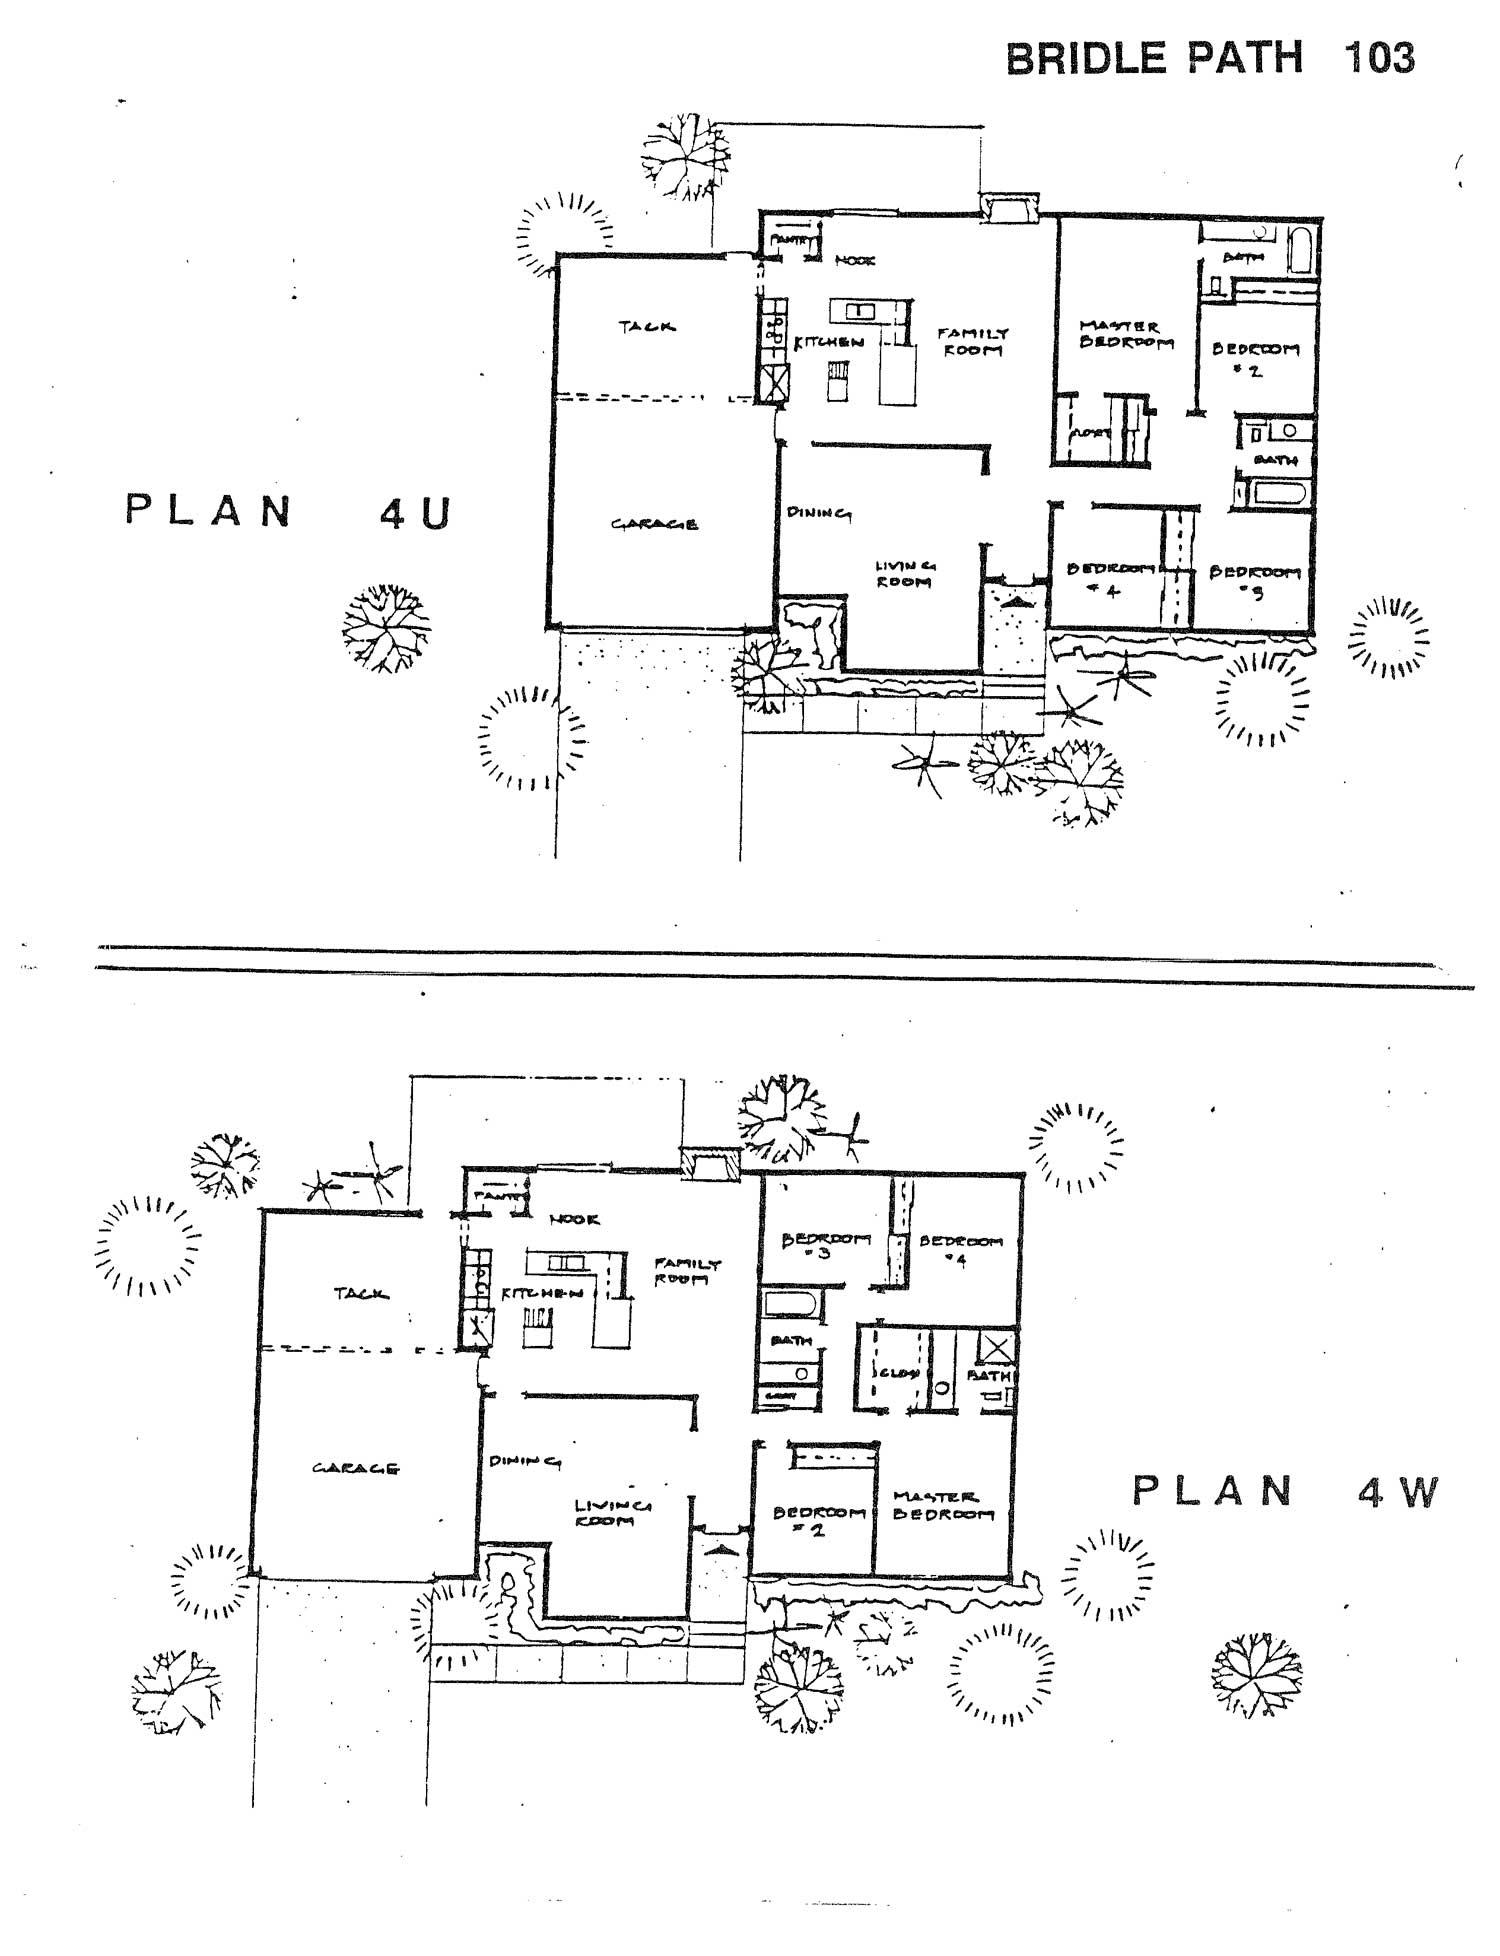 Bridle Path - Plan 4U & 4W